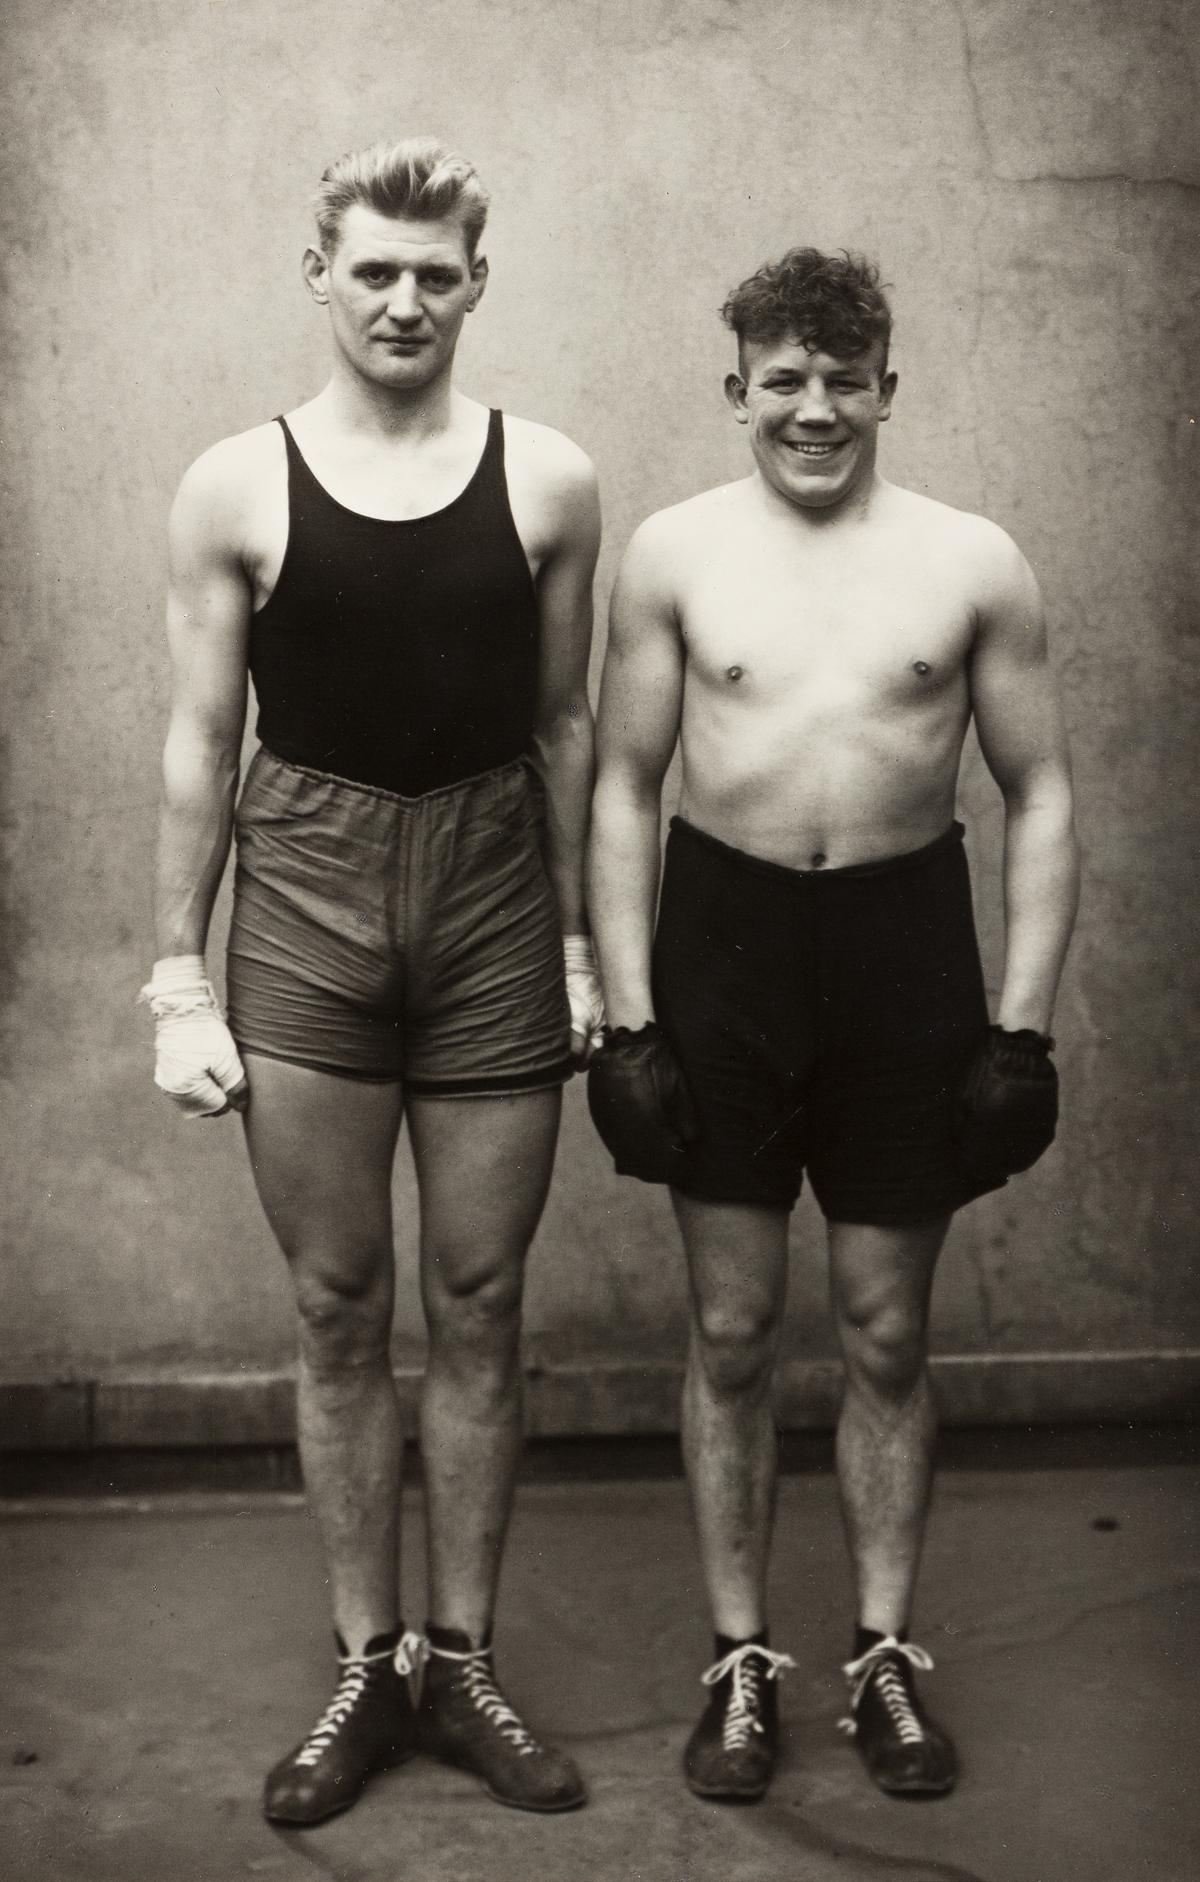 AUGUST SANDER (1876-1964)/GERD SANDER (1940) Boxers, Paul Röderstein and Hein Hesse, Köln.